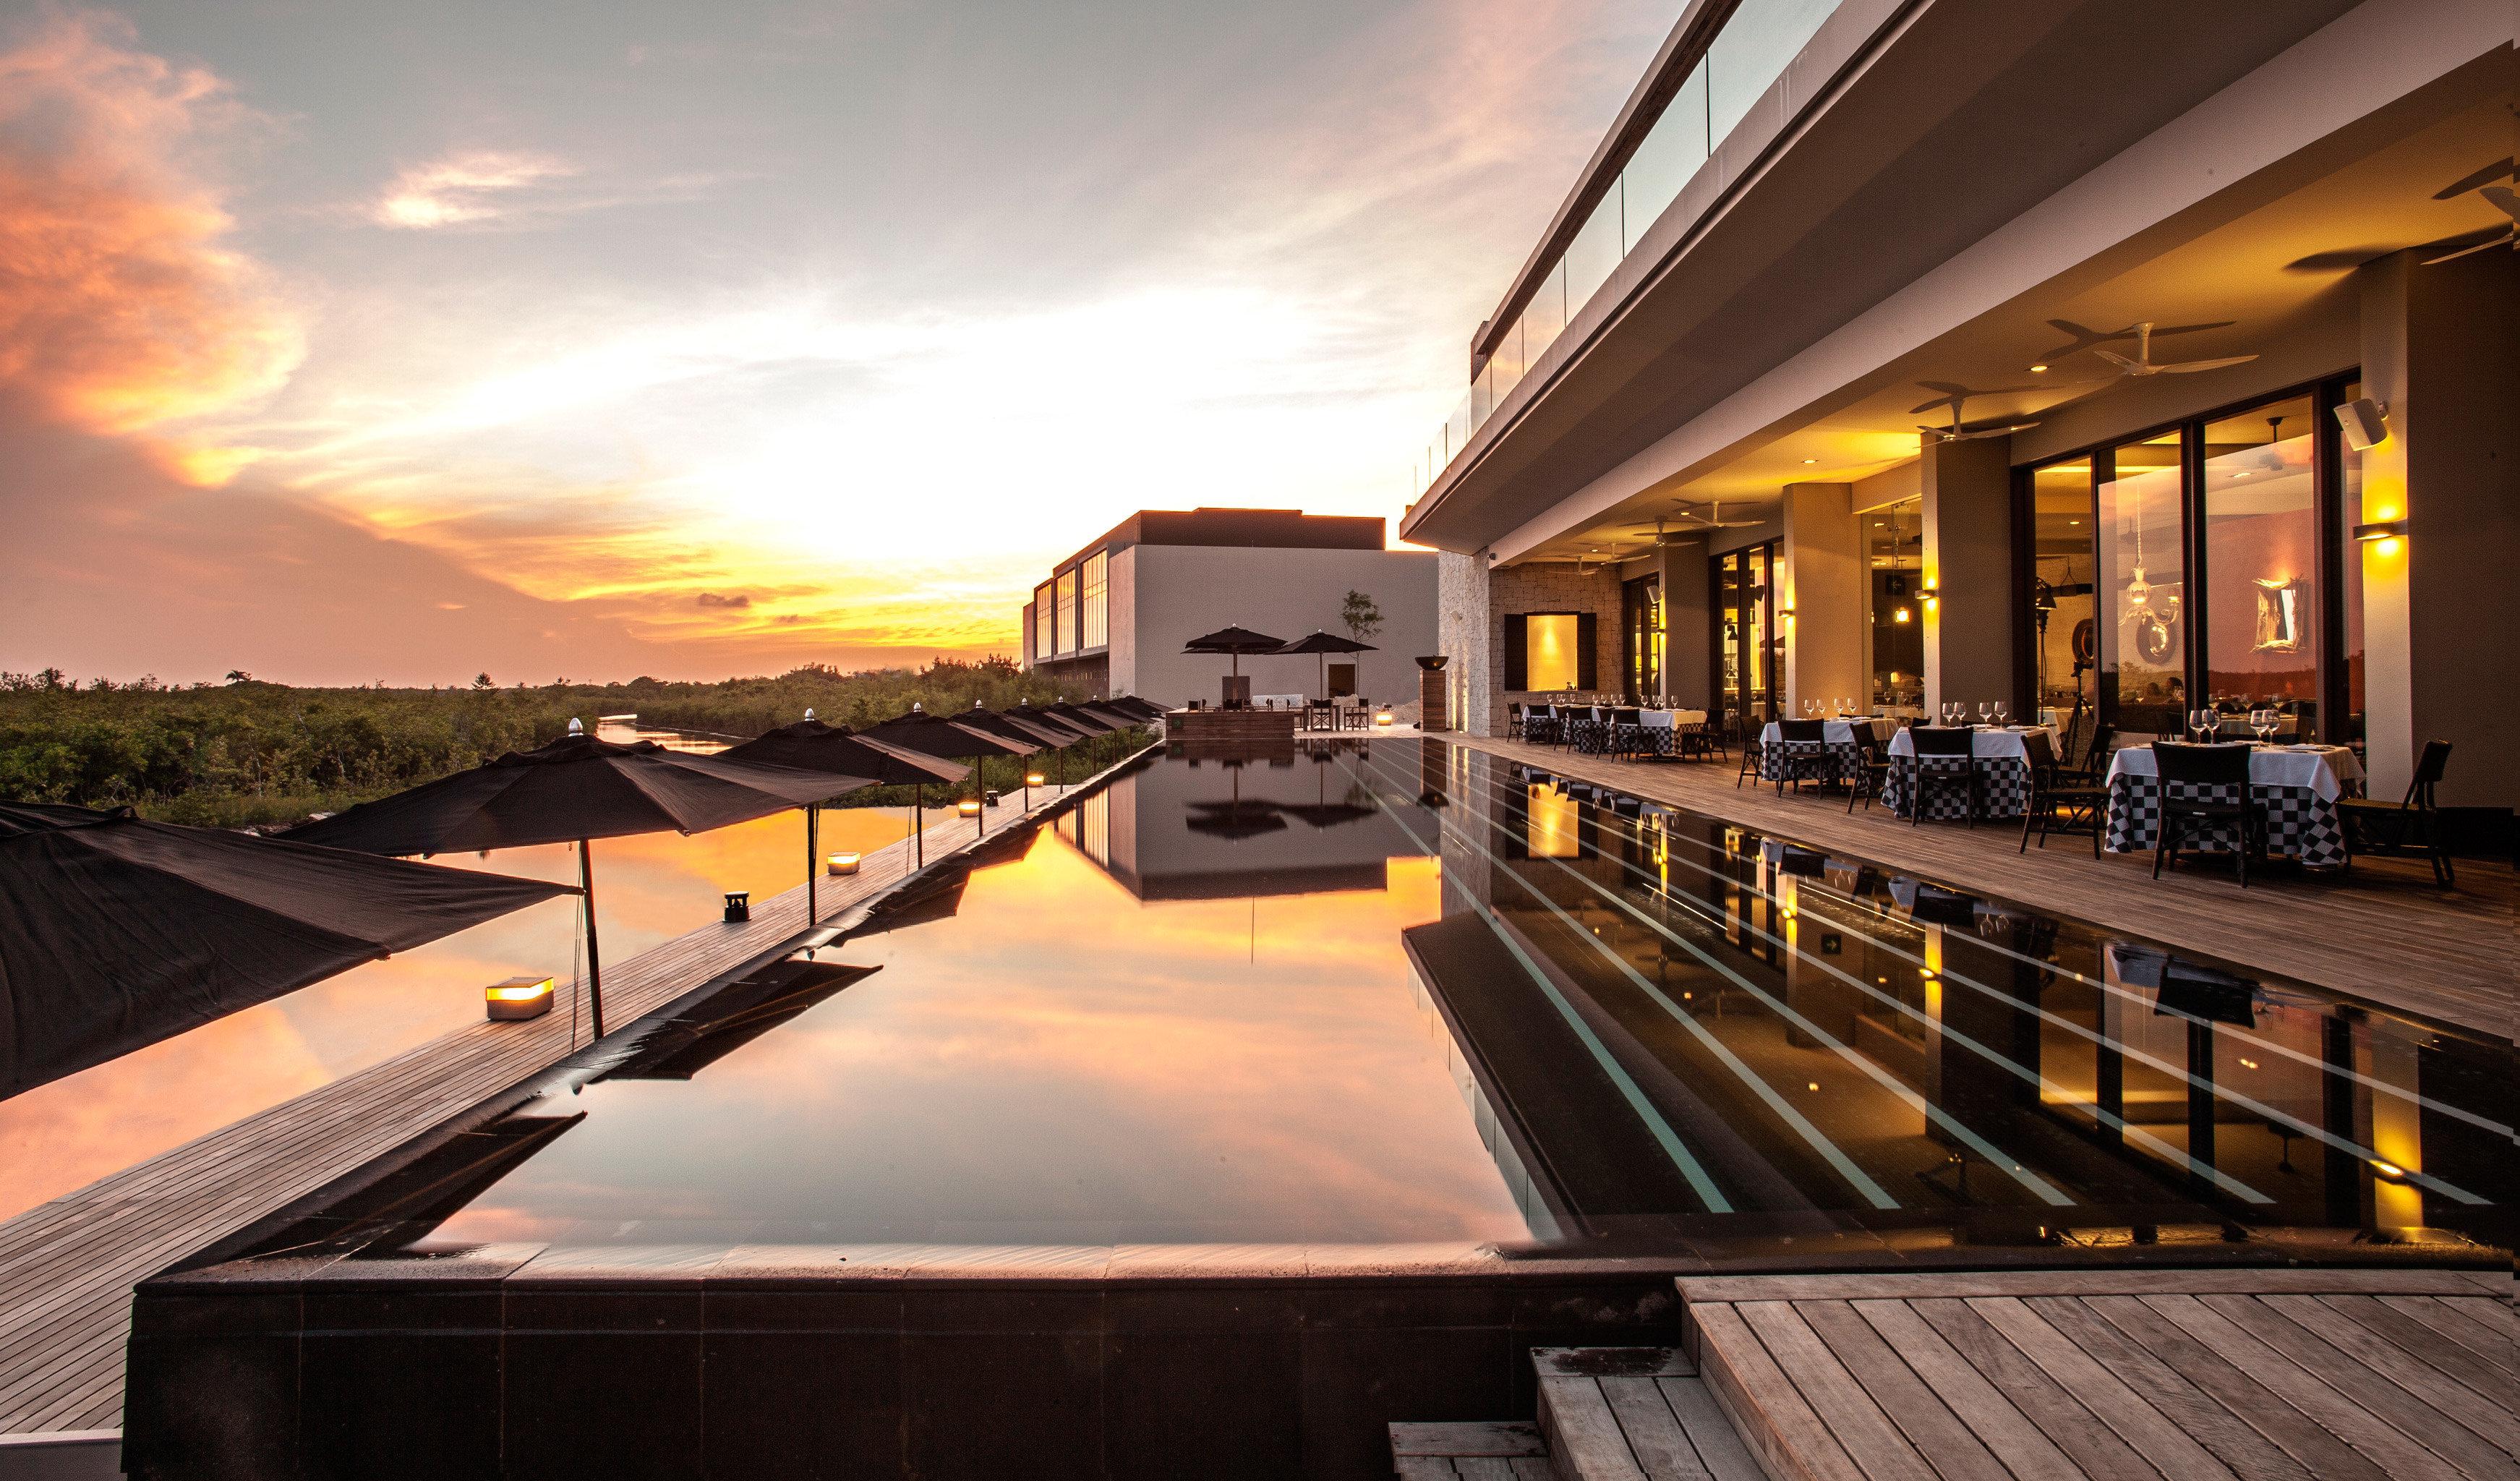 Luxury Modern Pool Romance Romantic Scenic views Sunset sky night light Architecture evening lighting dusk